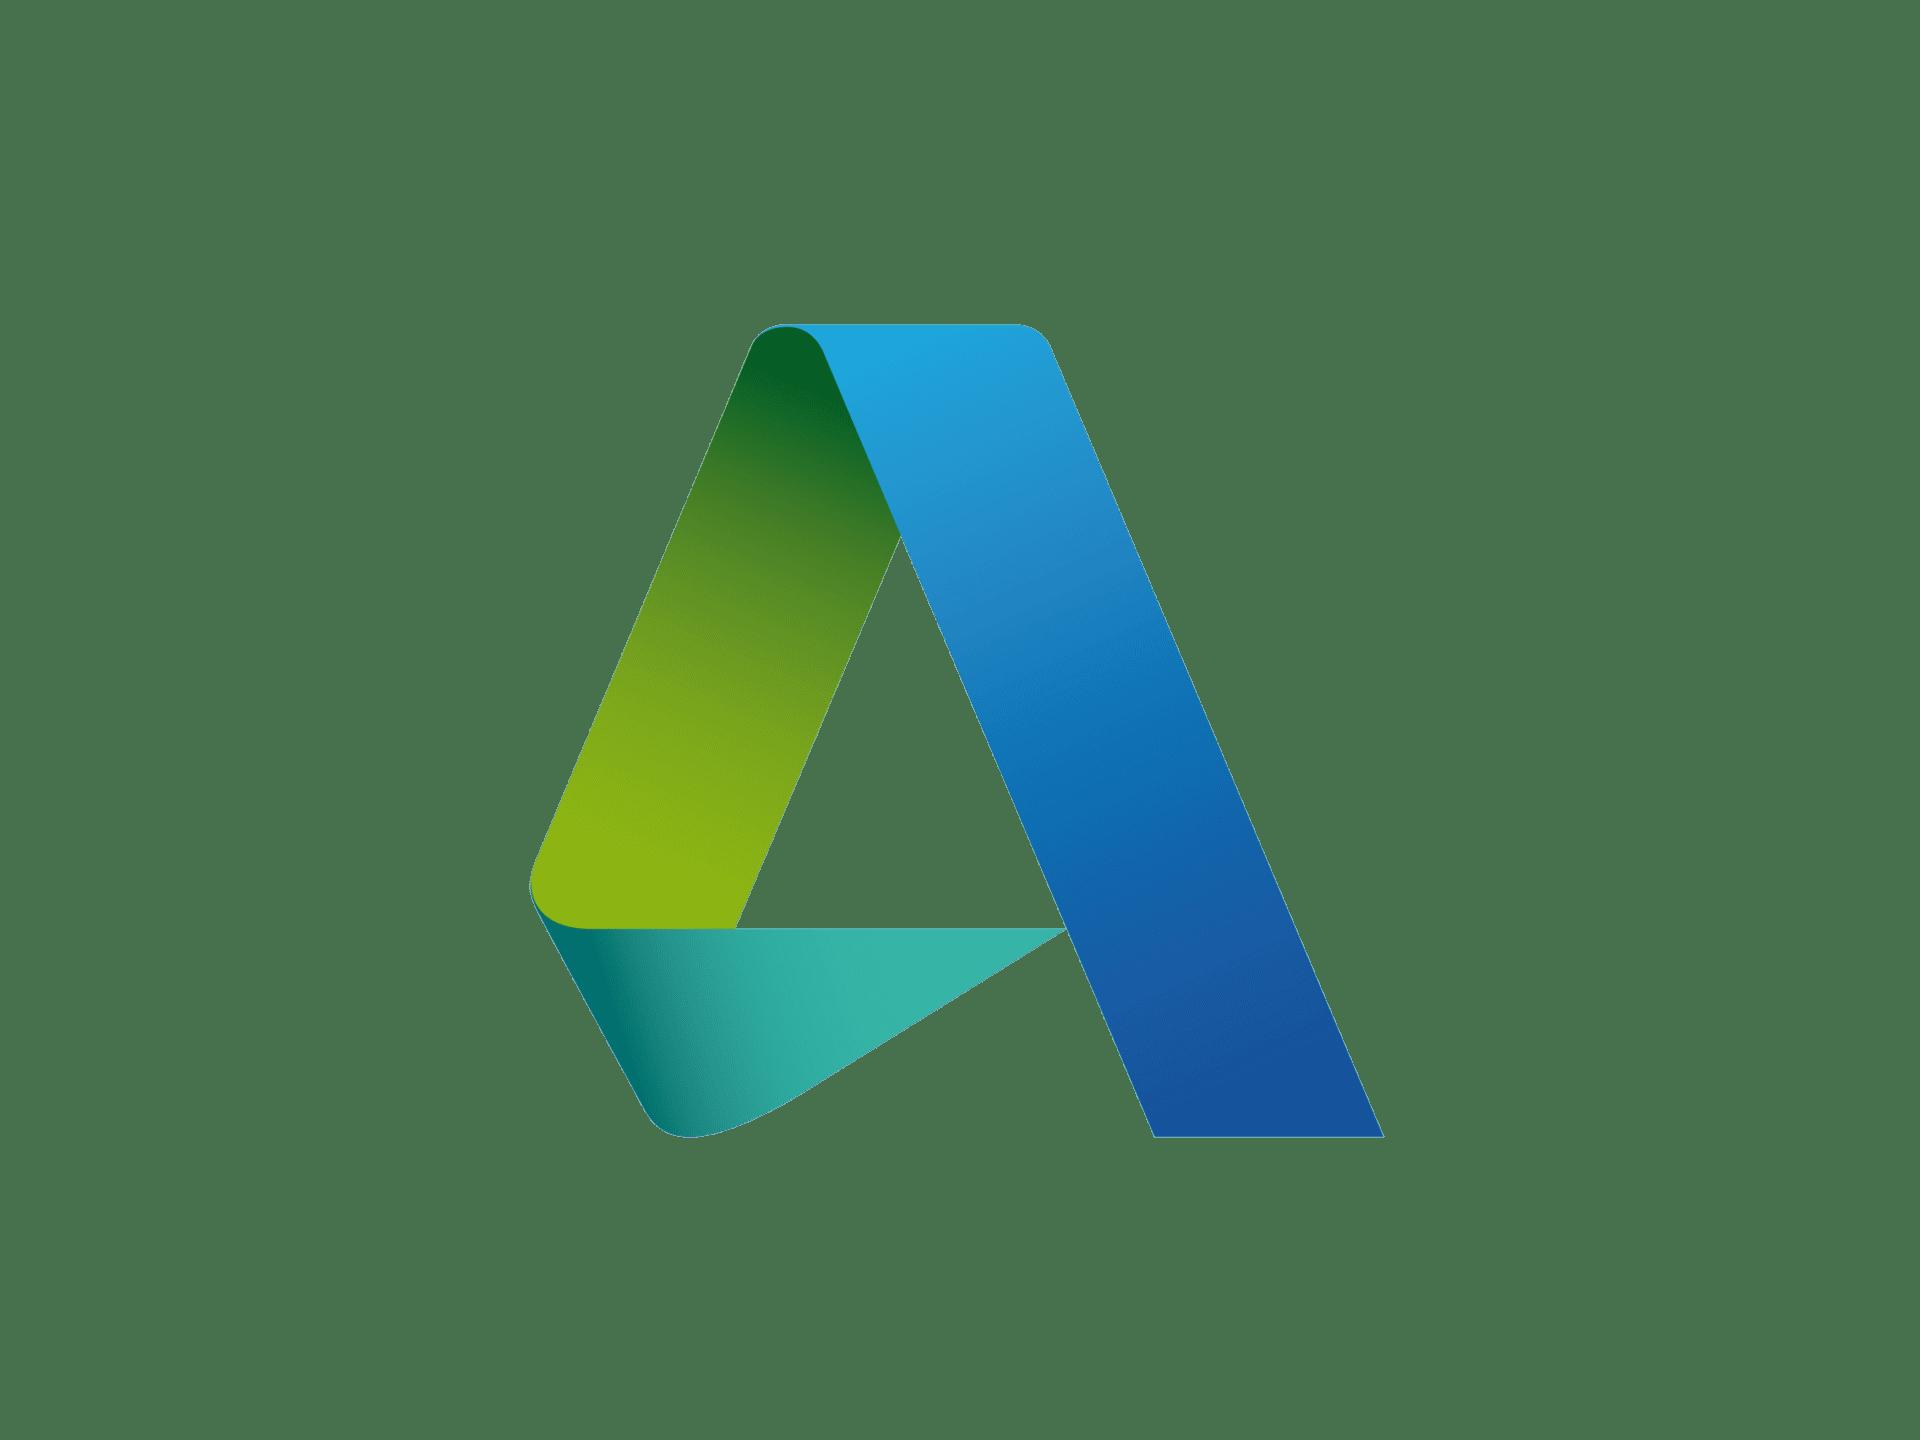 autodesk-logo-png-autodesk-unveils-complete-manufacturing-software-portfolio-tct-magazine-2272